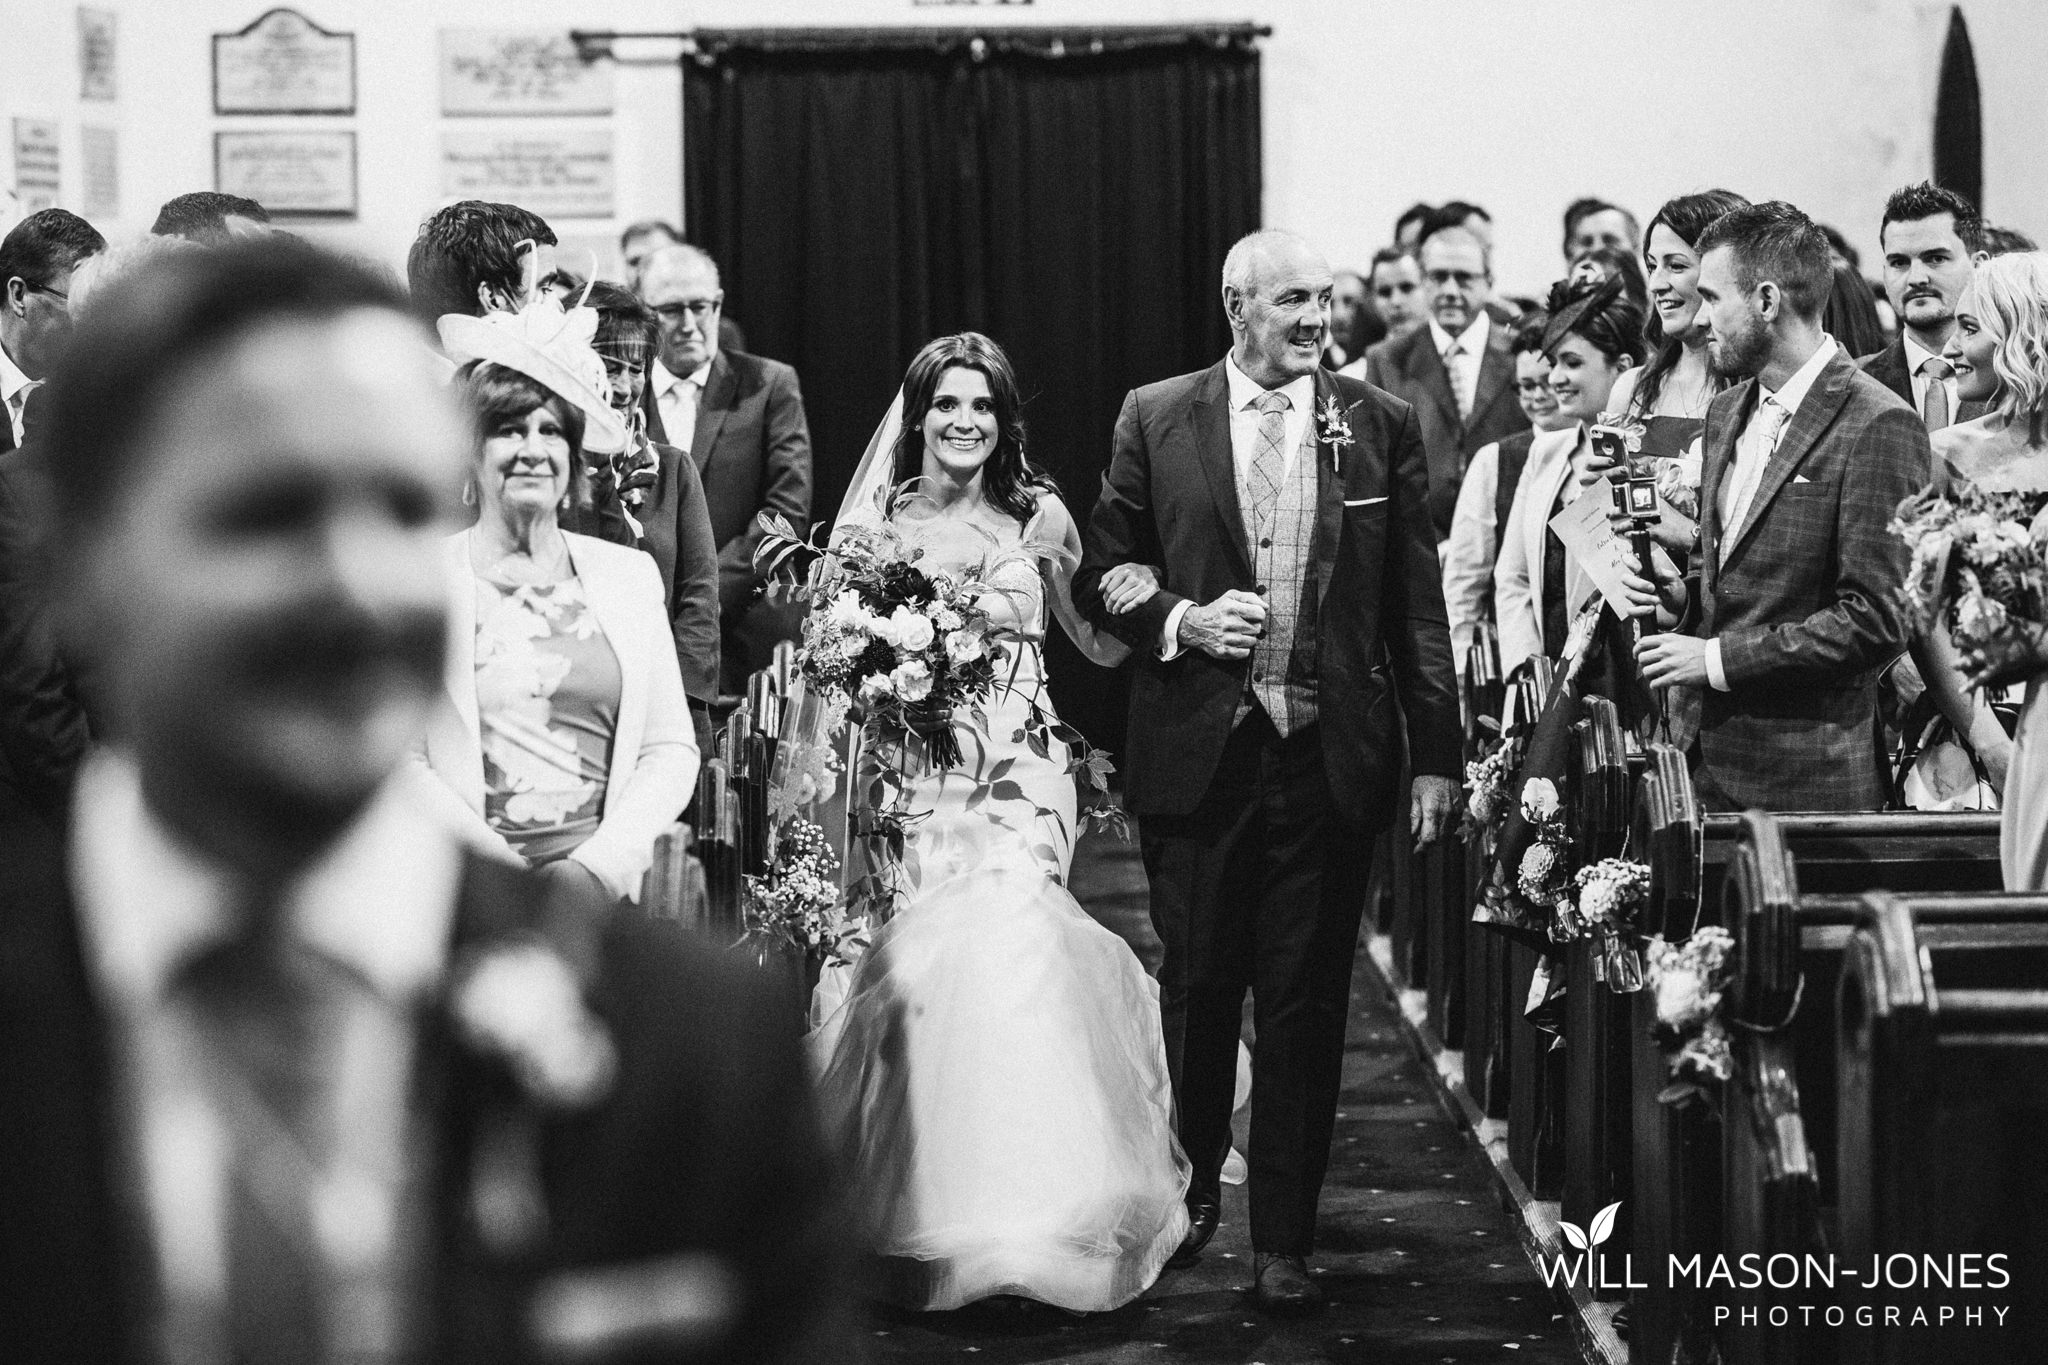 rainy-wet-llandybie-church-wedding-ceremony-swansea-photographers-7.jpg